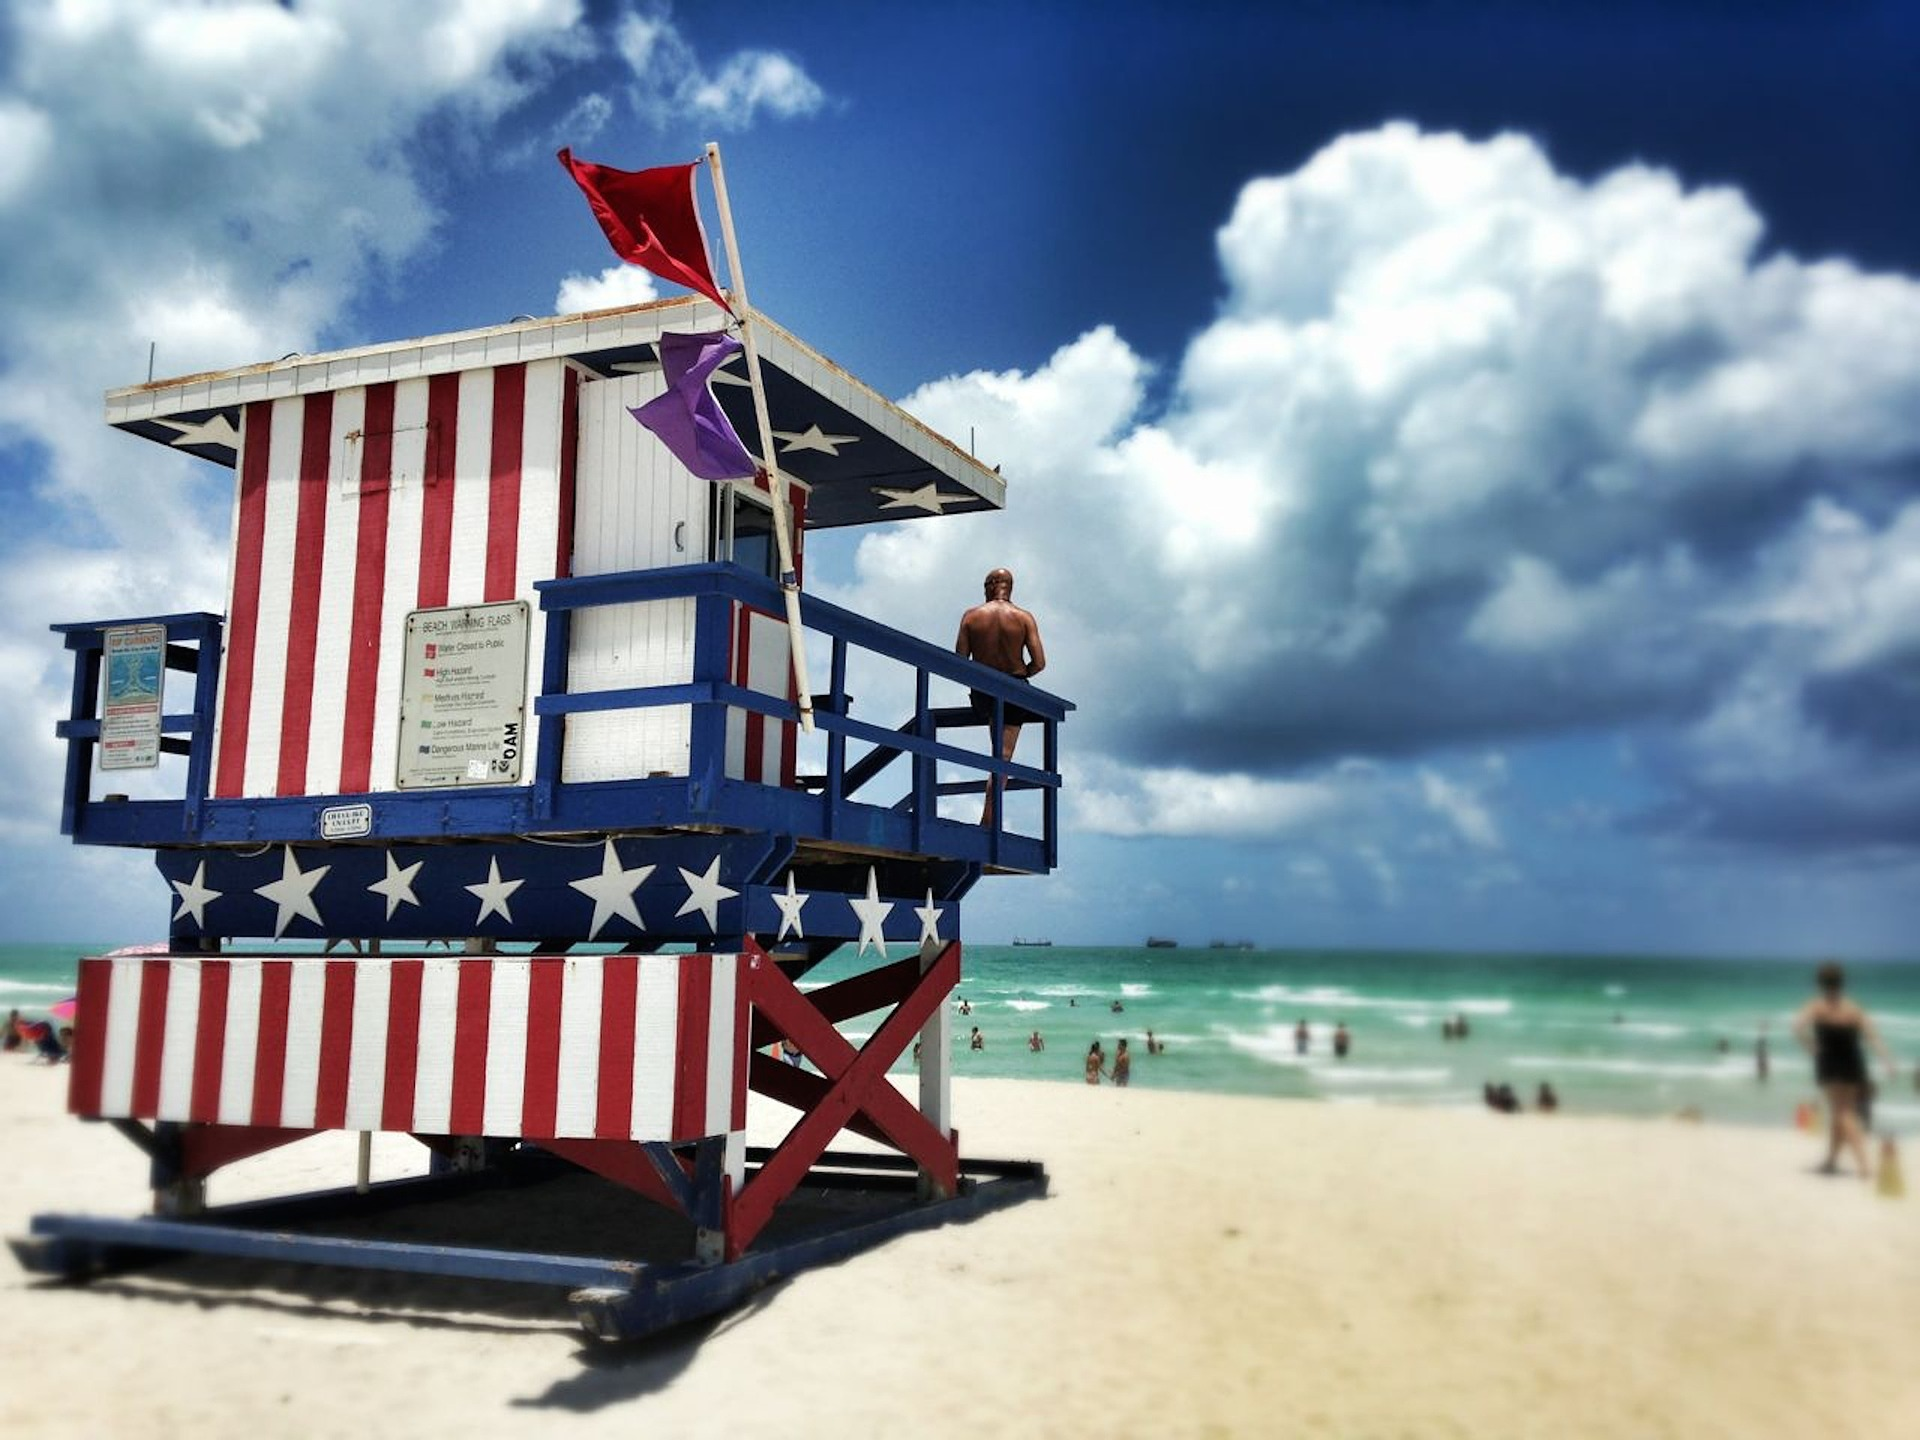 Florida Reisetipps & Deals Urlaub in Orlando & Florida ab 369,98€